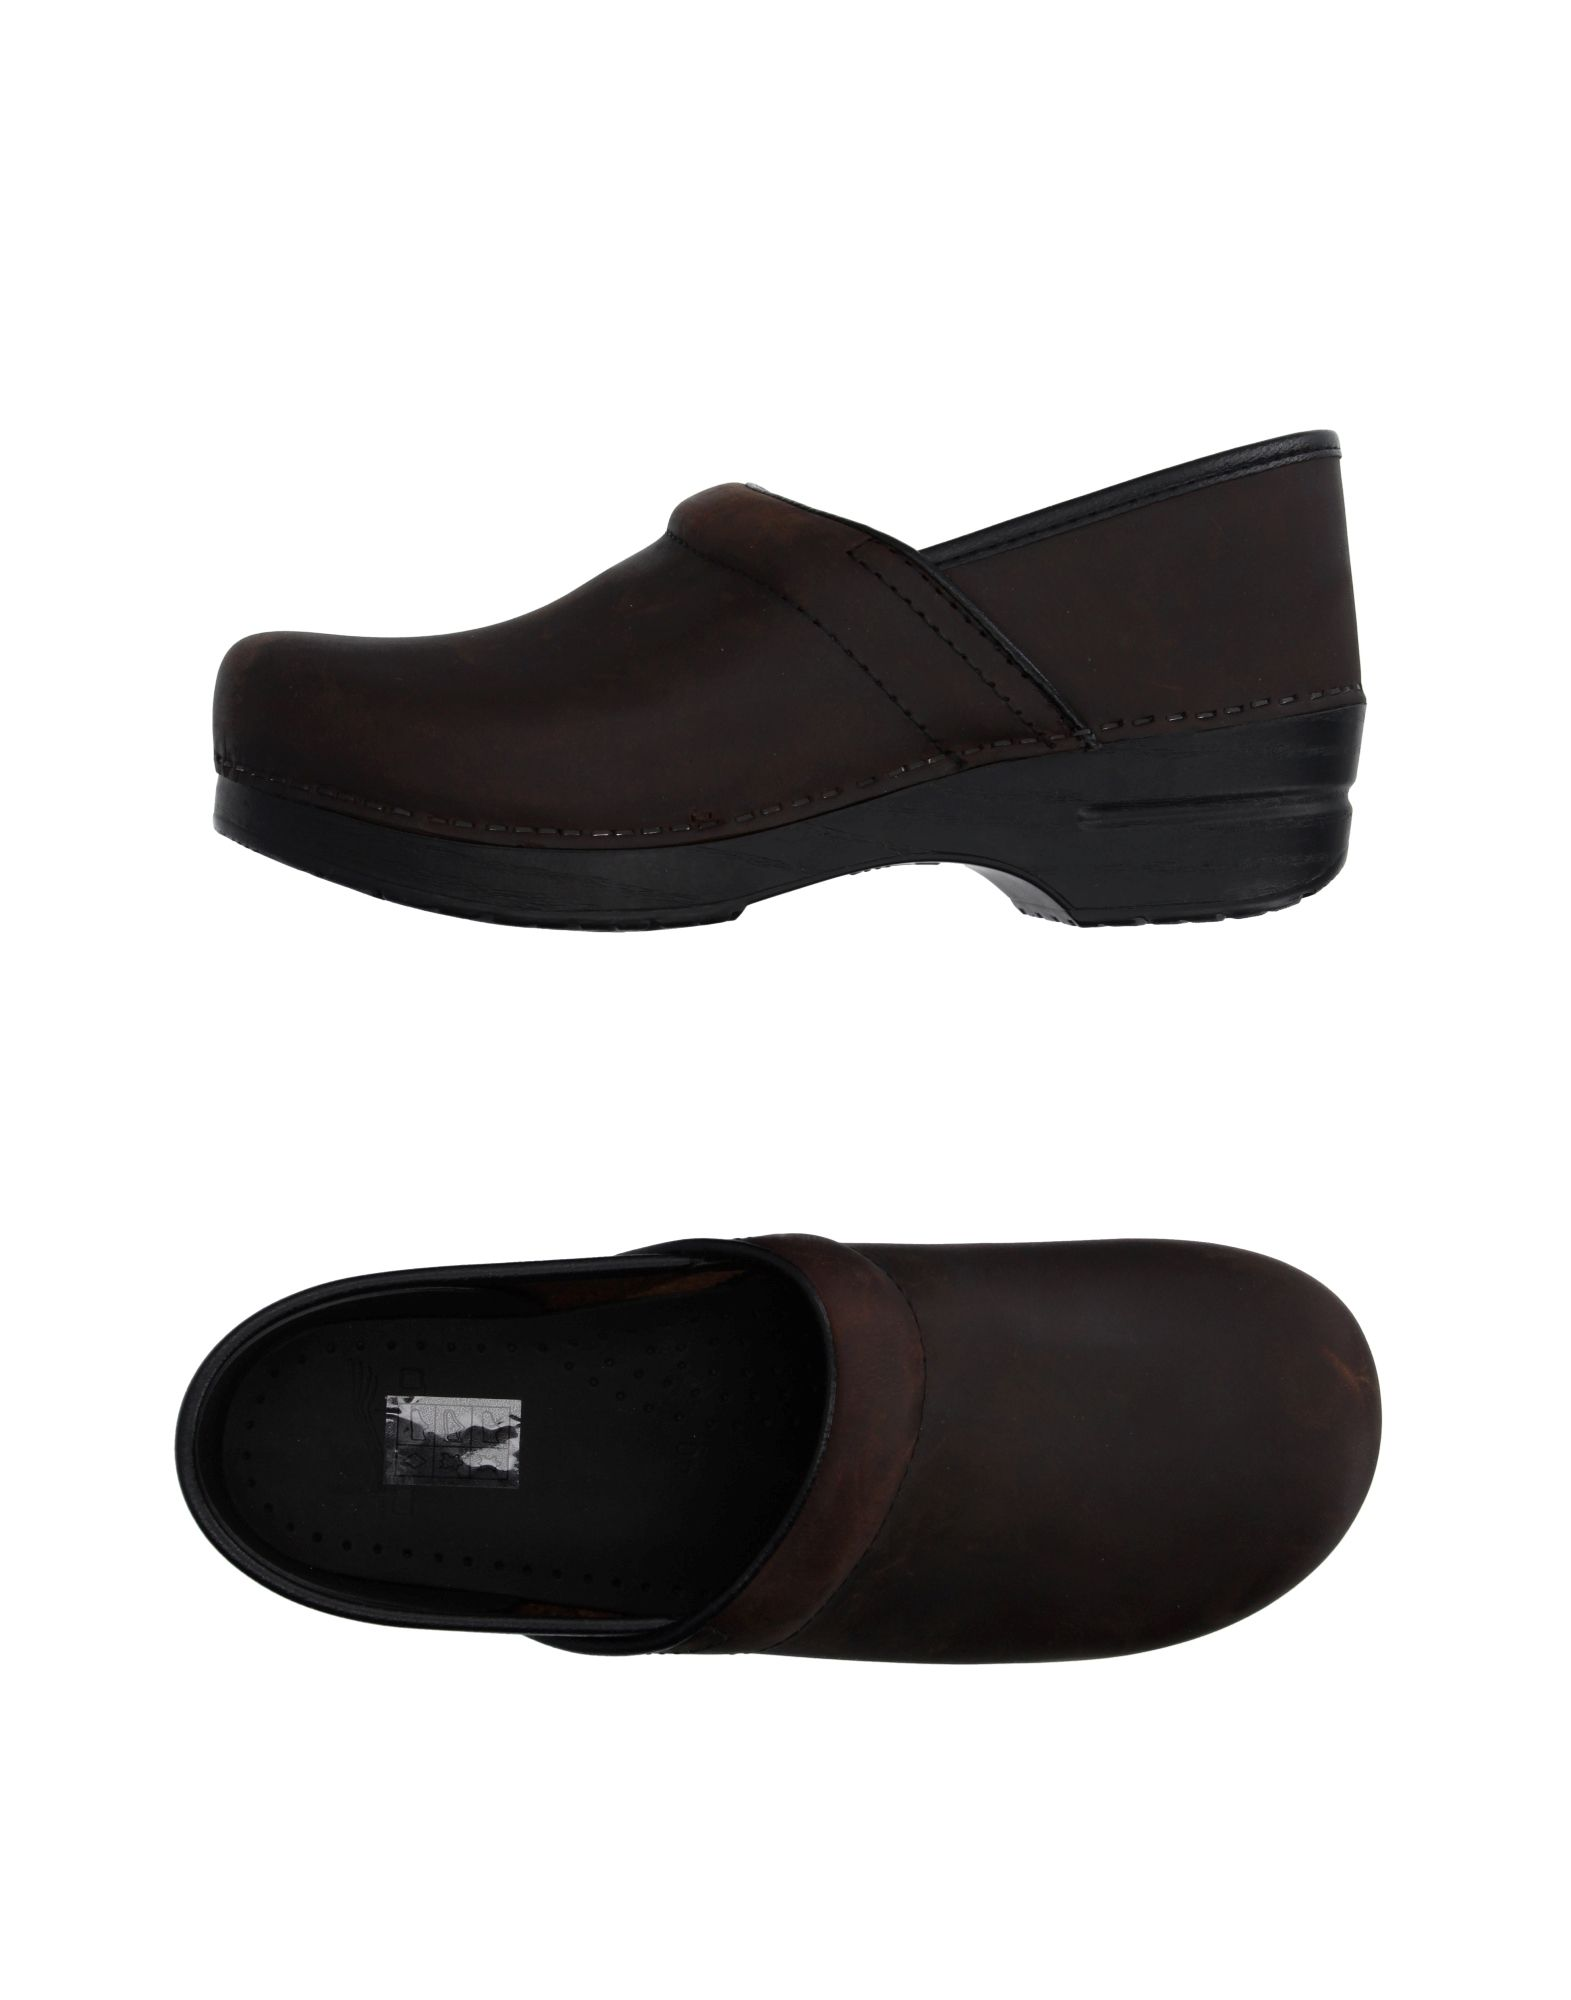 Dansko Mokassins Damen  11068800TL Gute Qualität beliebte Schuhe